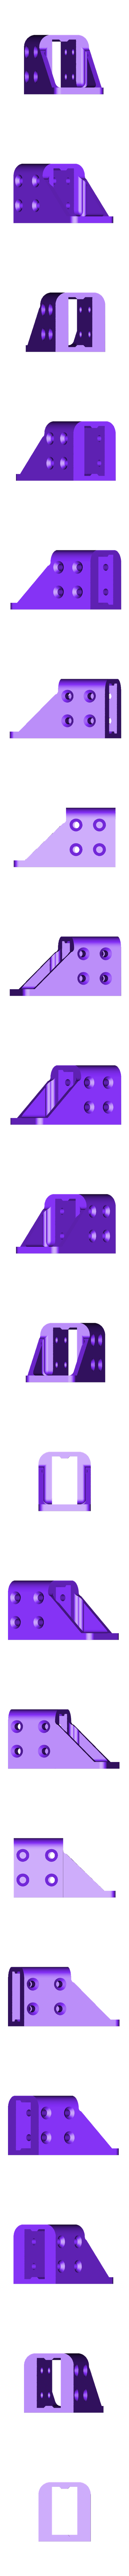 piece_nema.STL Download free STL file stepper support v-slot 2040 • 3D print object, vingautmobile